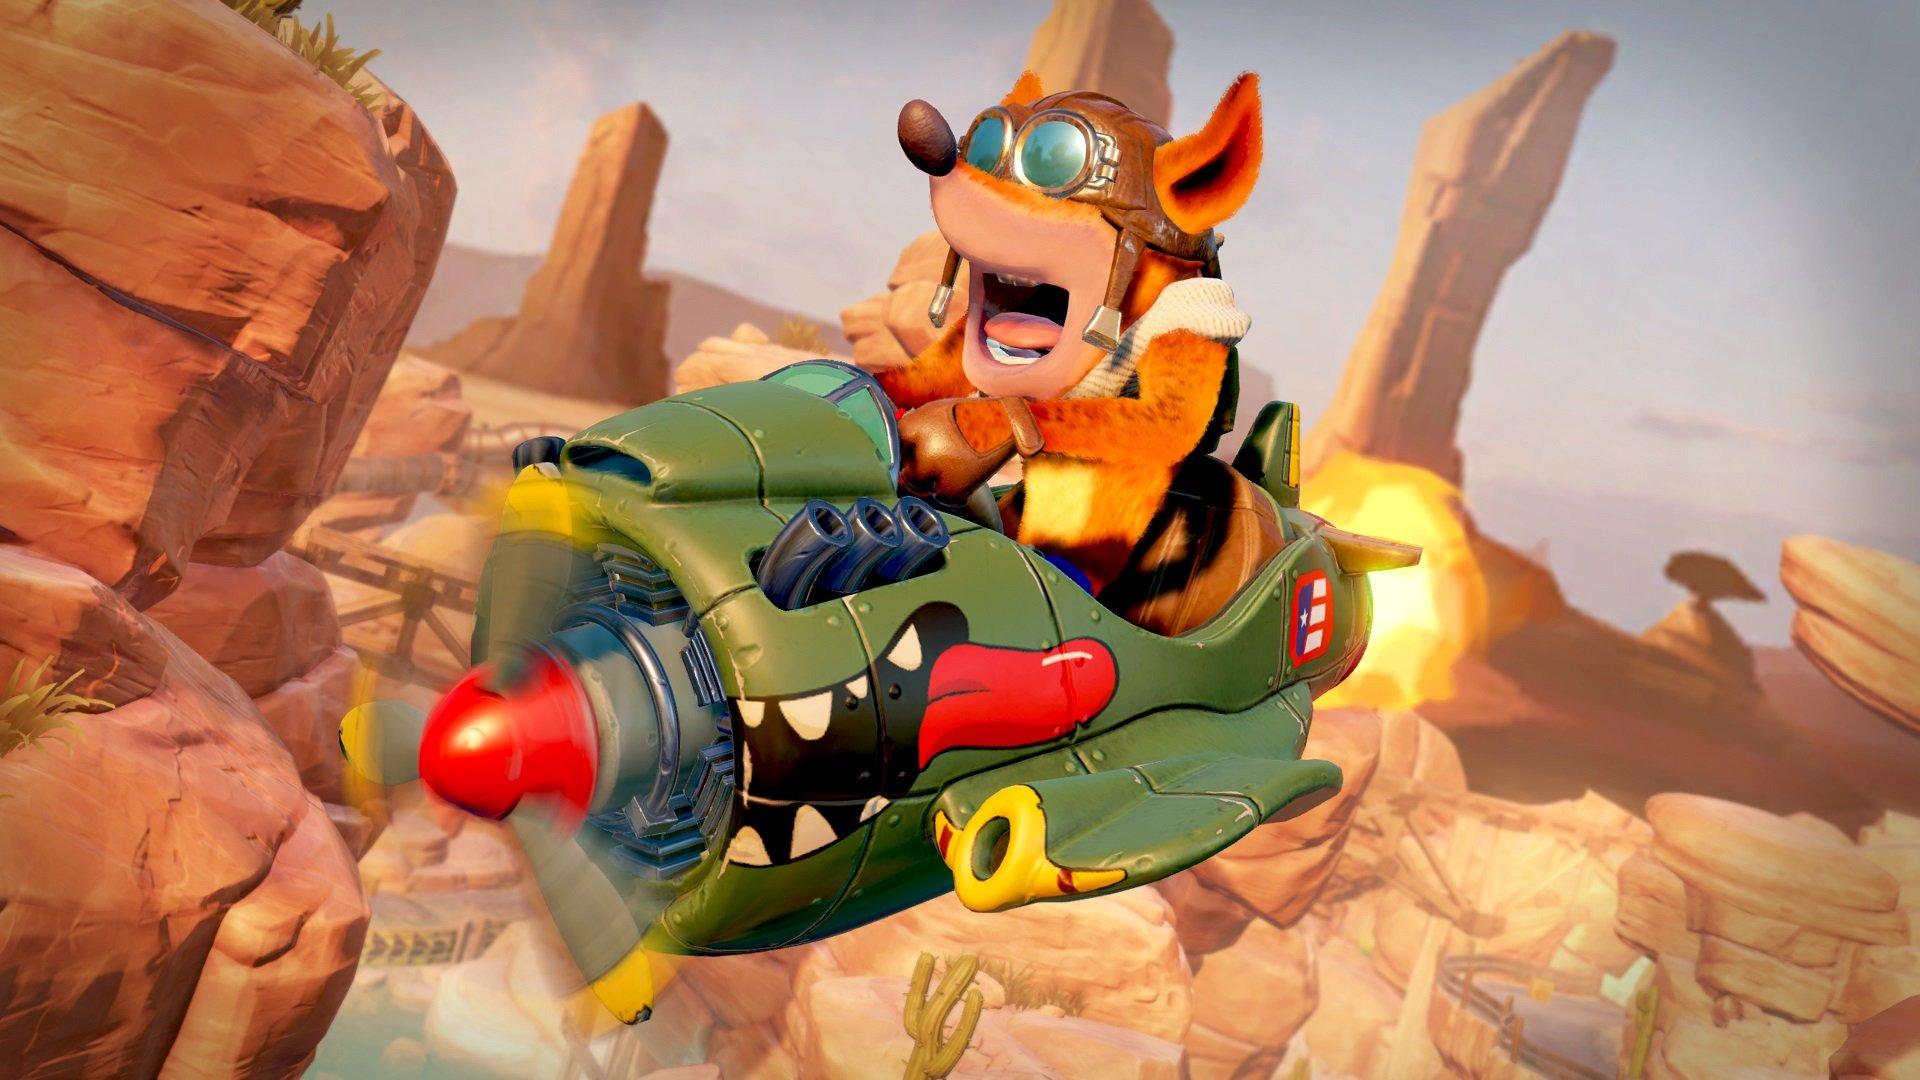 Crash Team Racing Nitro Fueled Firehawk